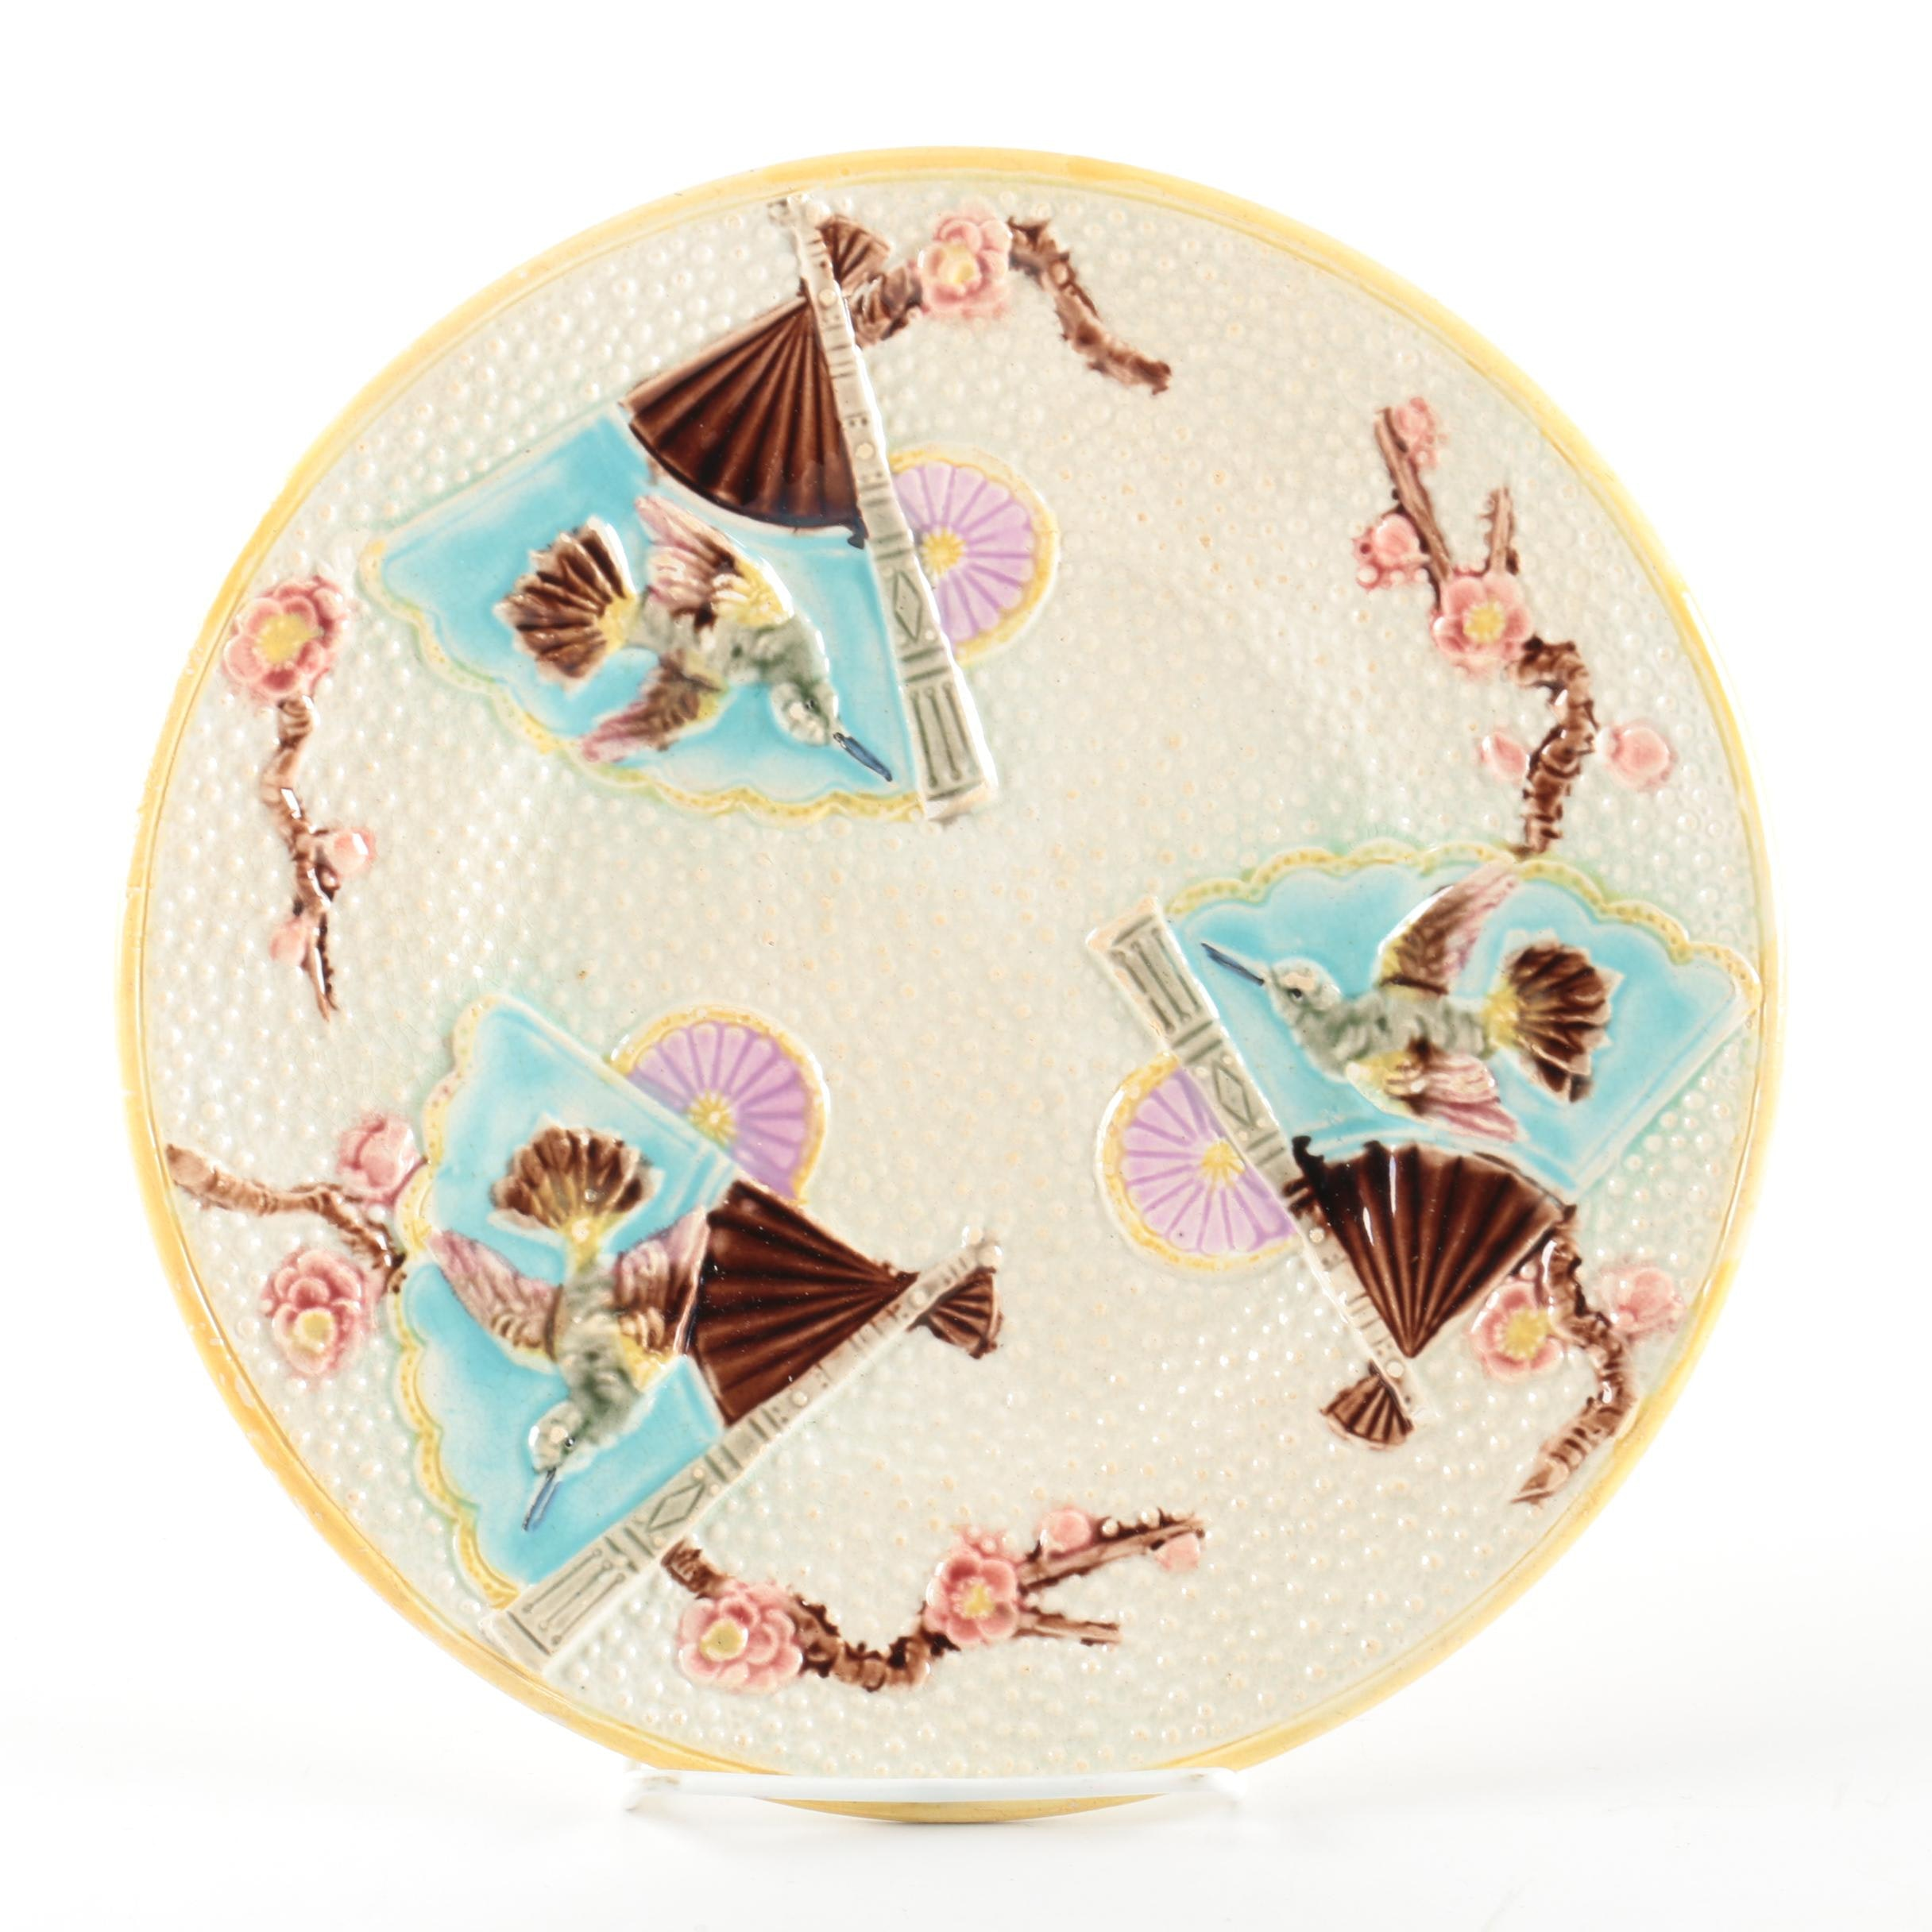 Antique English Japonesque Majolica Plate